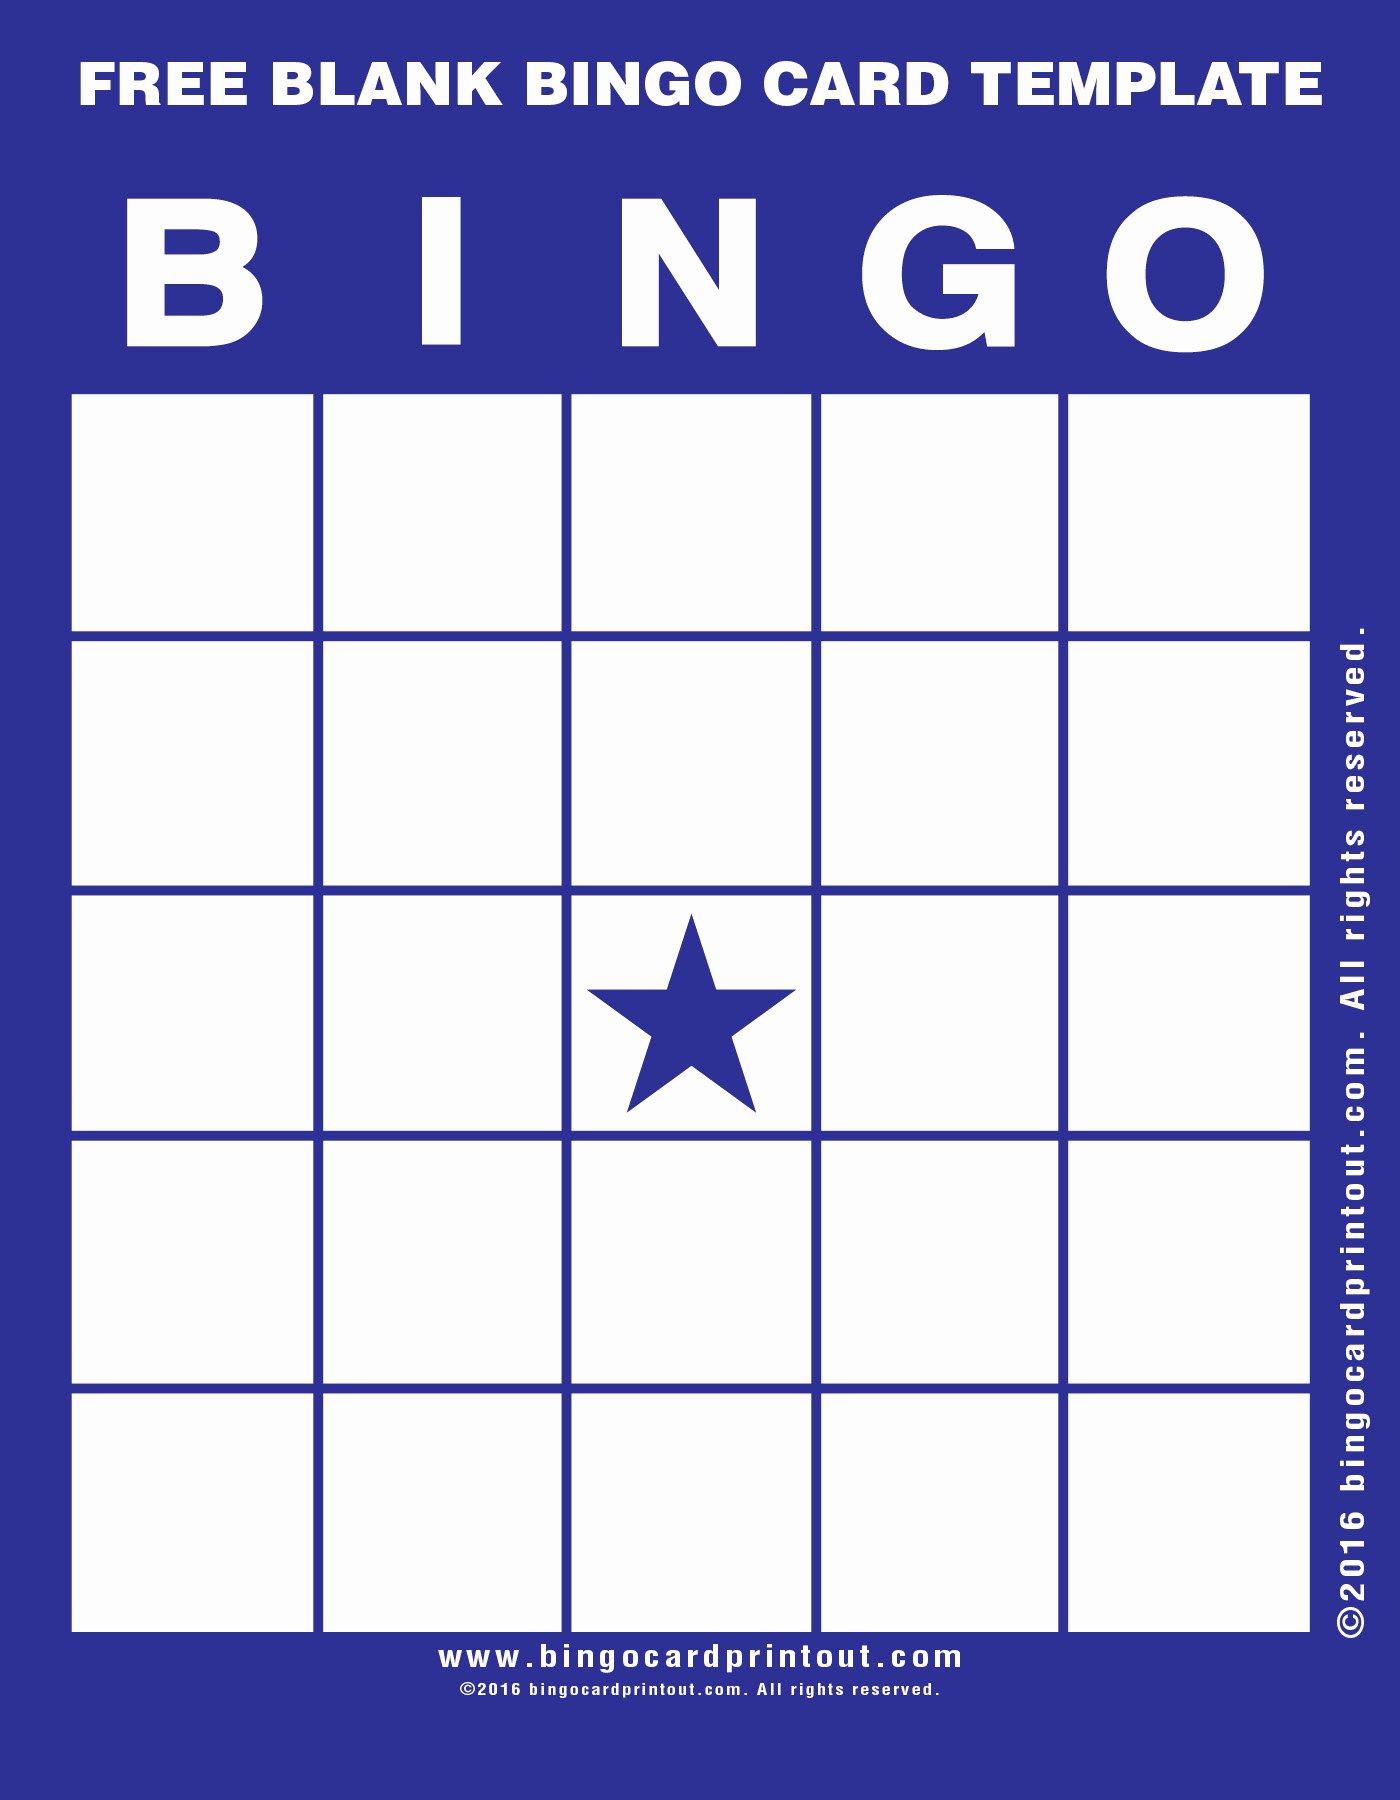 Free Blank Bingo Cards Elegant Free Blank Bingo Card Template Bingocardprintout